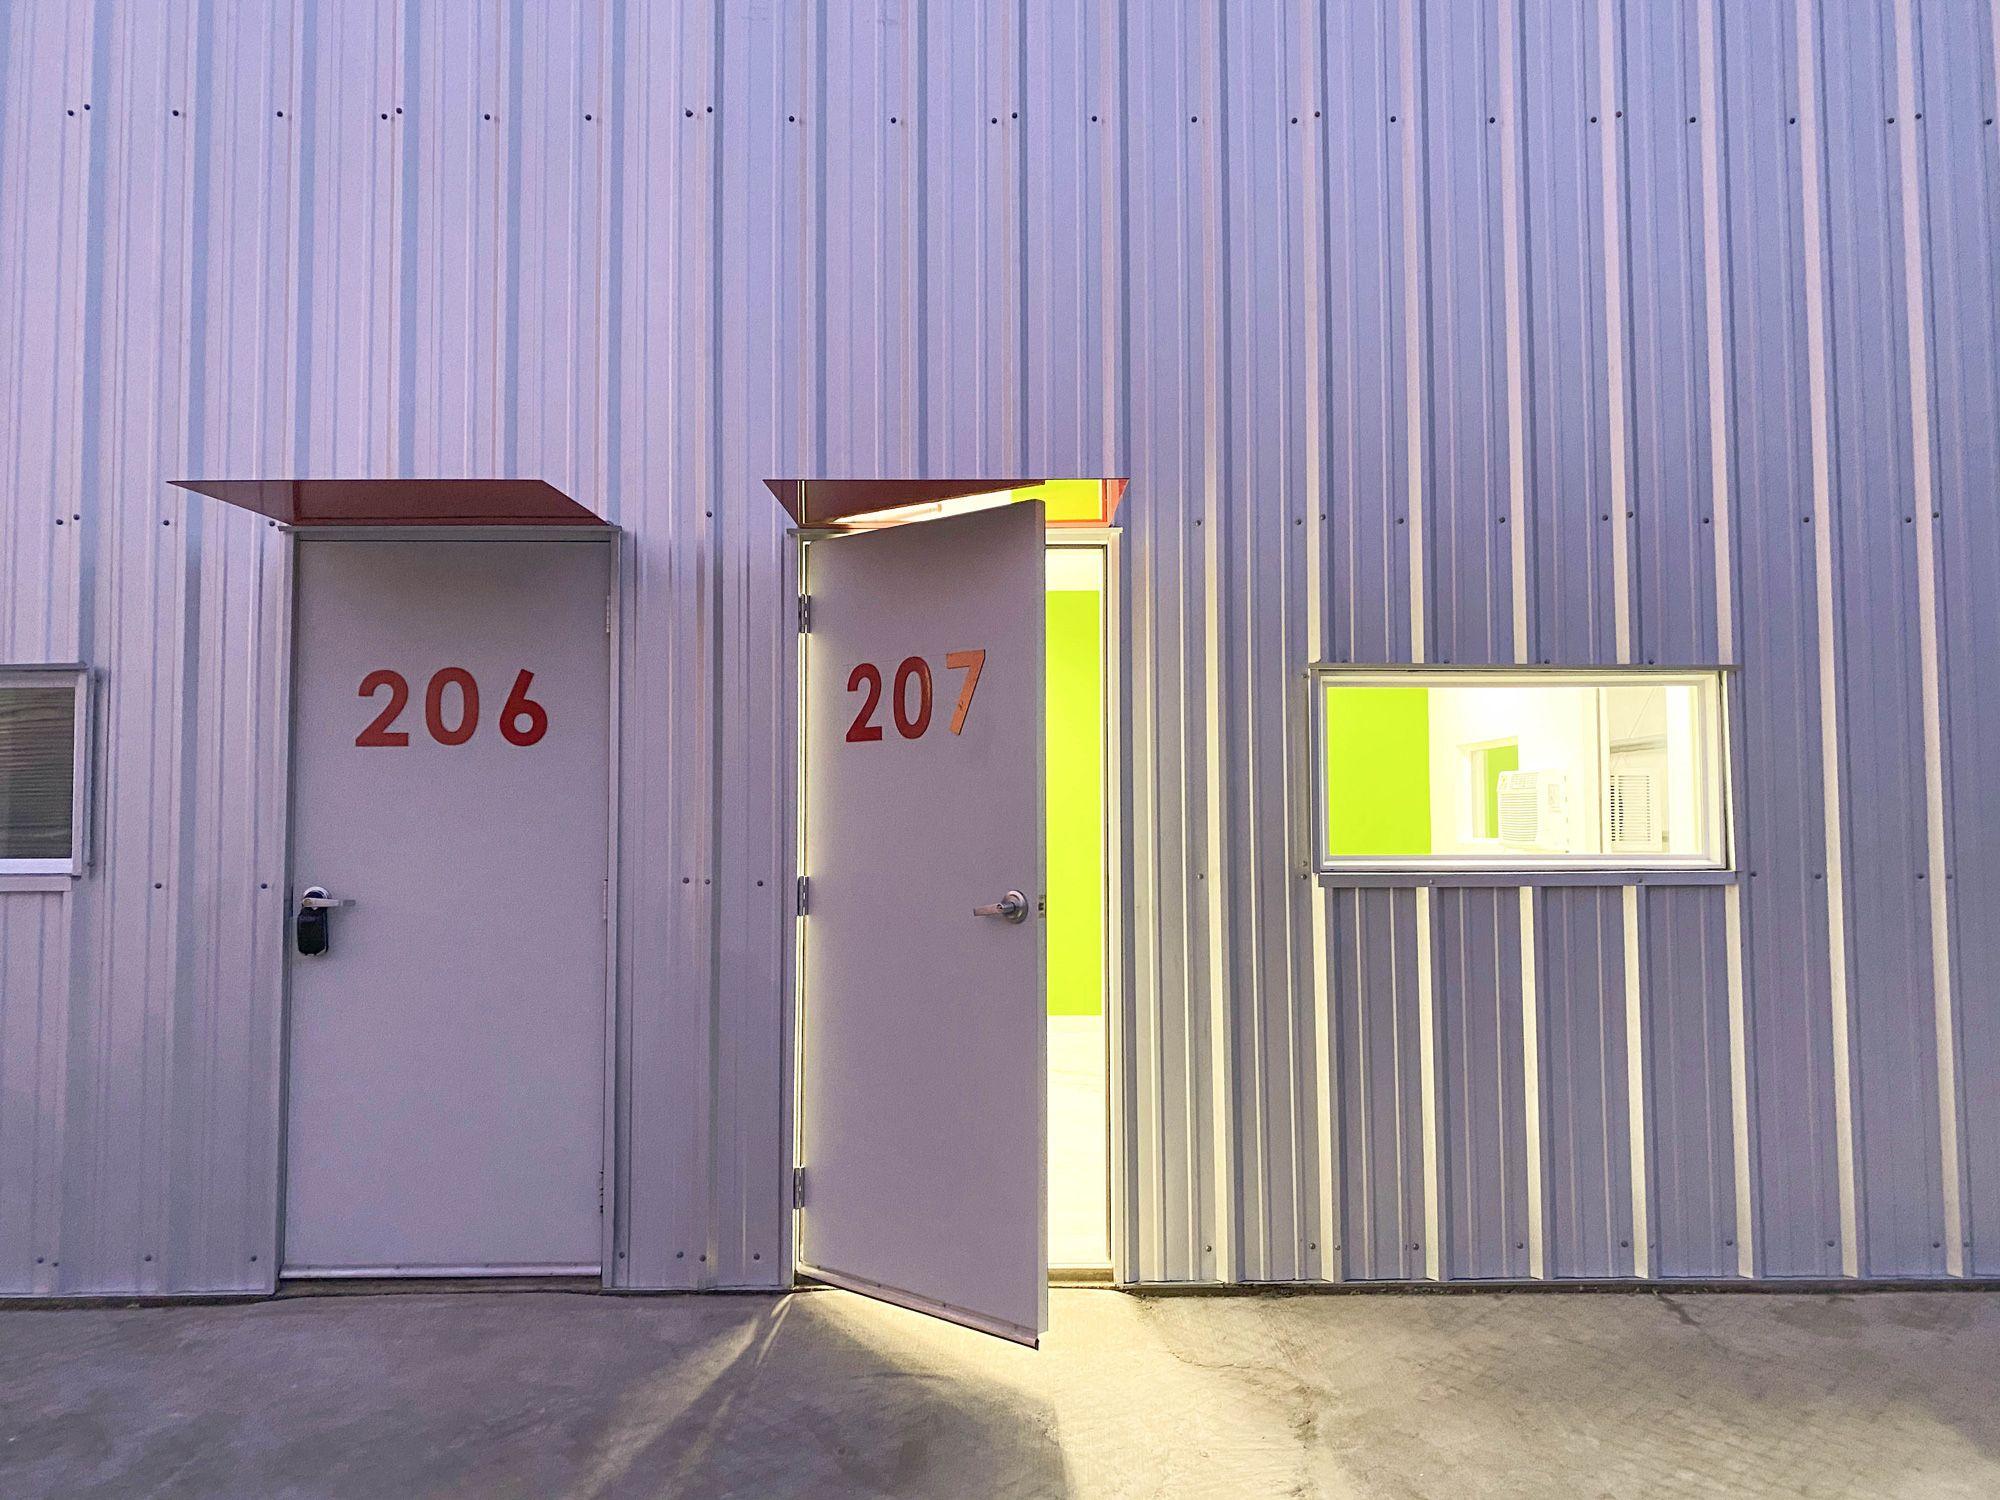 satterwhite business park lease space